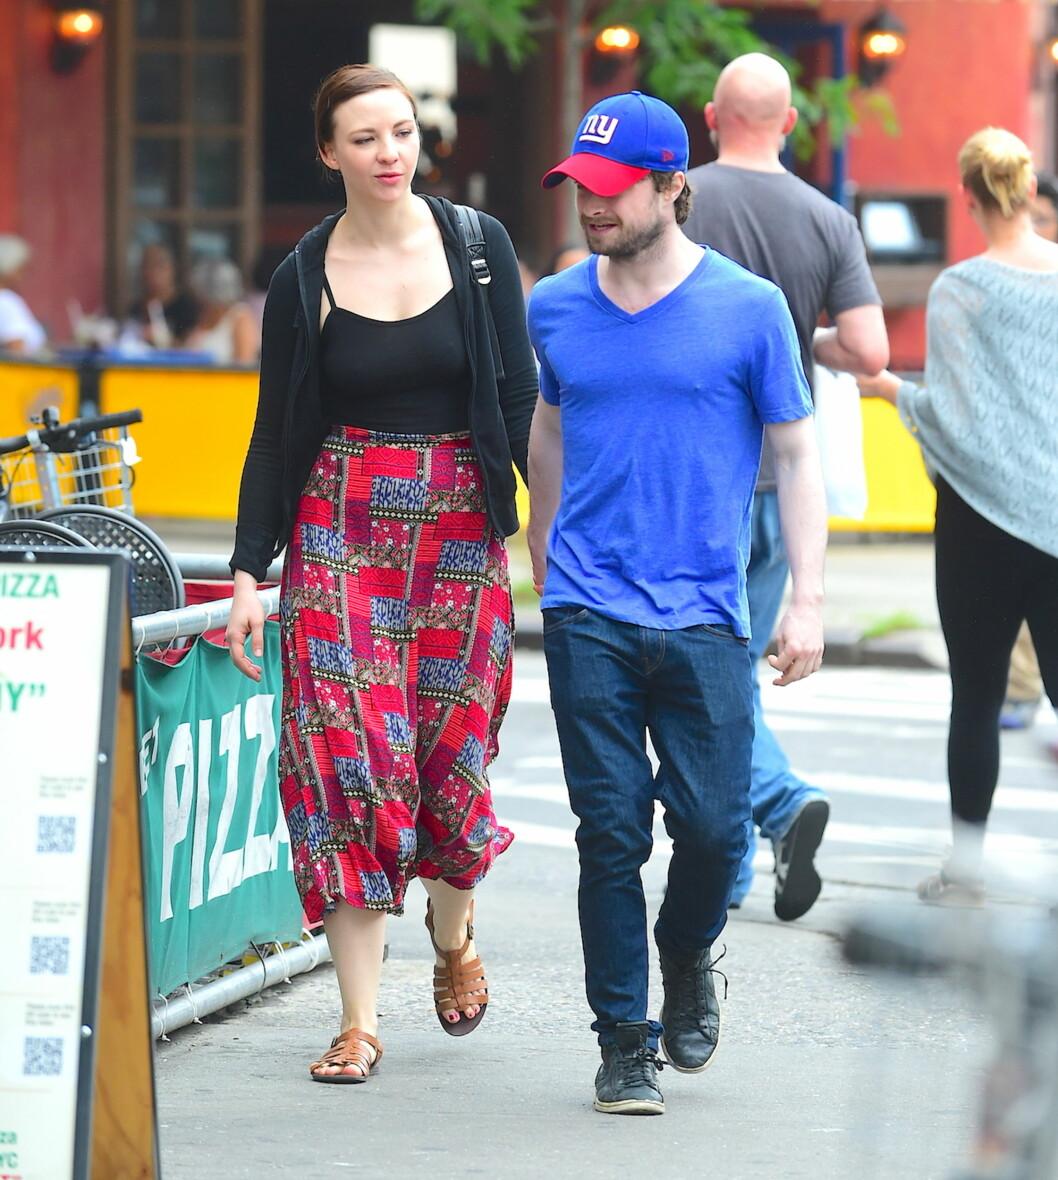 SØTE: Erin Darke og Daniel Radcliffe på gåtur i New York.   Foto: Splash News